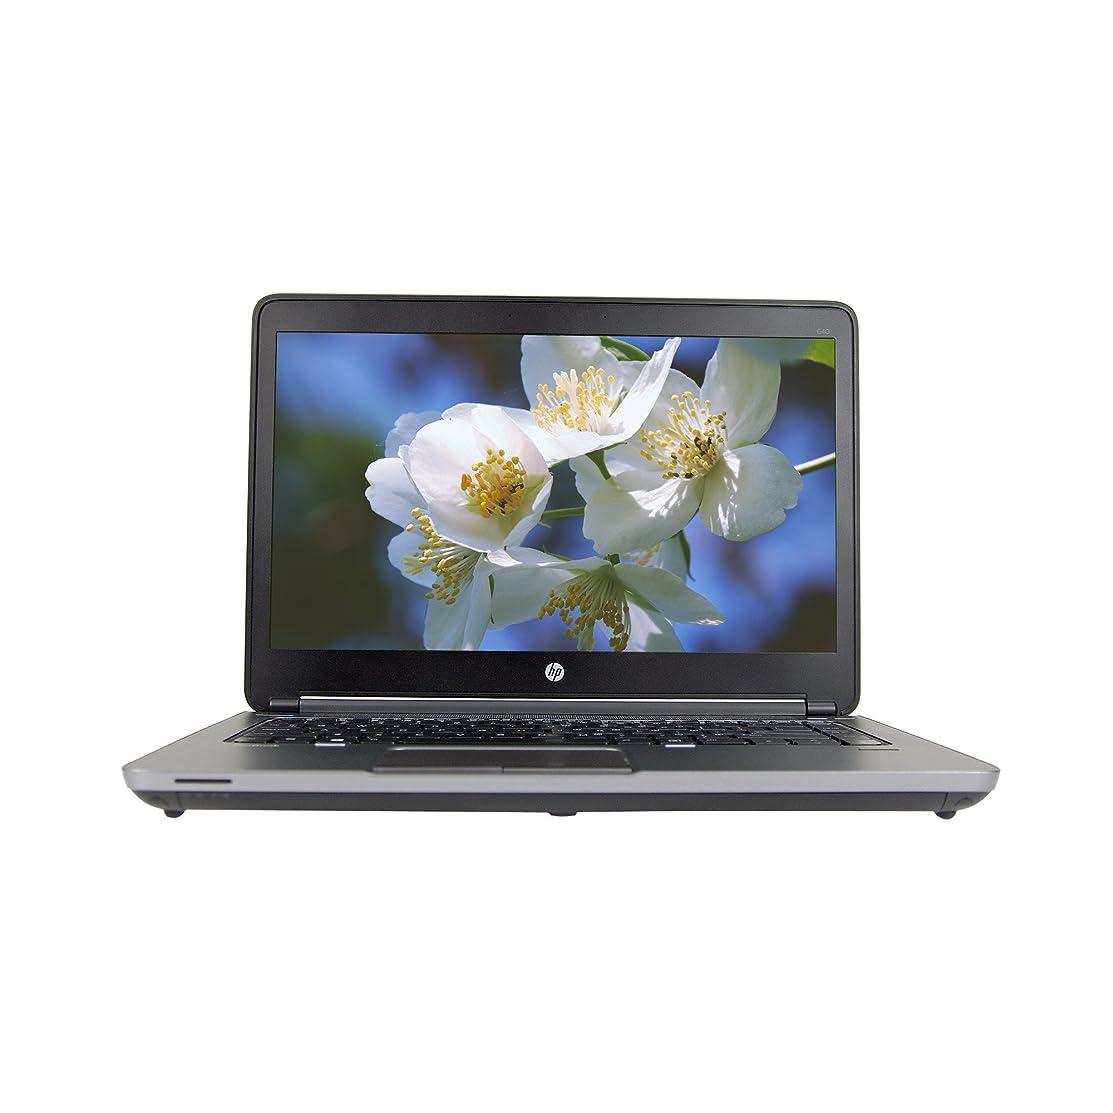 HP ProBook 640 G1 14in Laptop, Core i5-4300M 2.6GHz, 4GB Ram, 256GB SSD, Windows 10 Pro 64bit (Renewed)